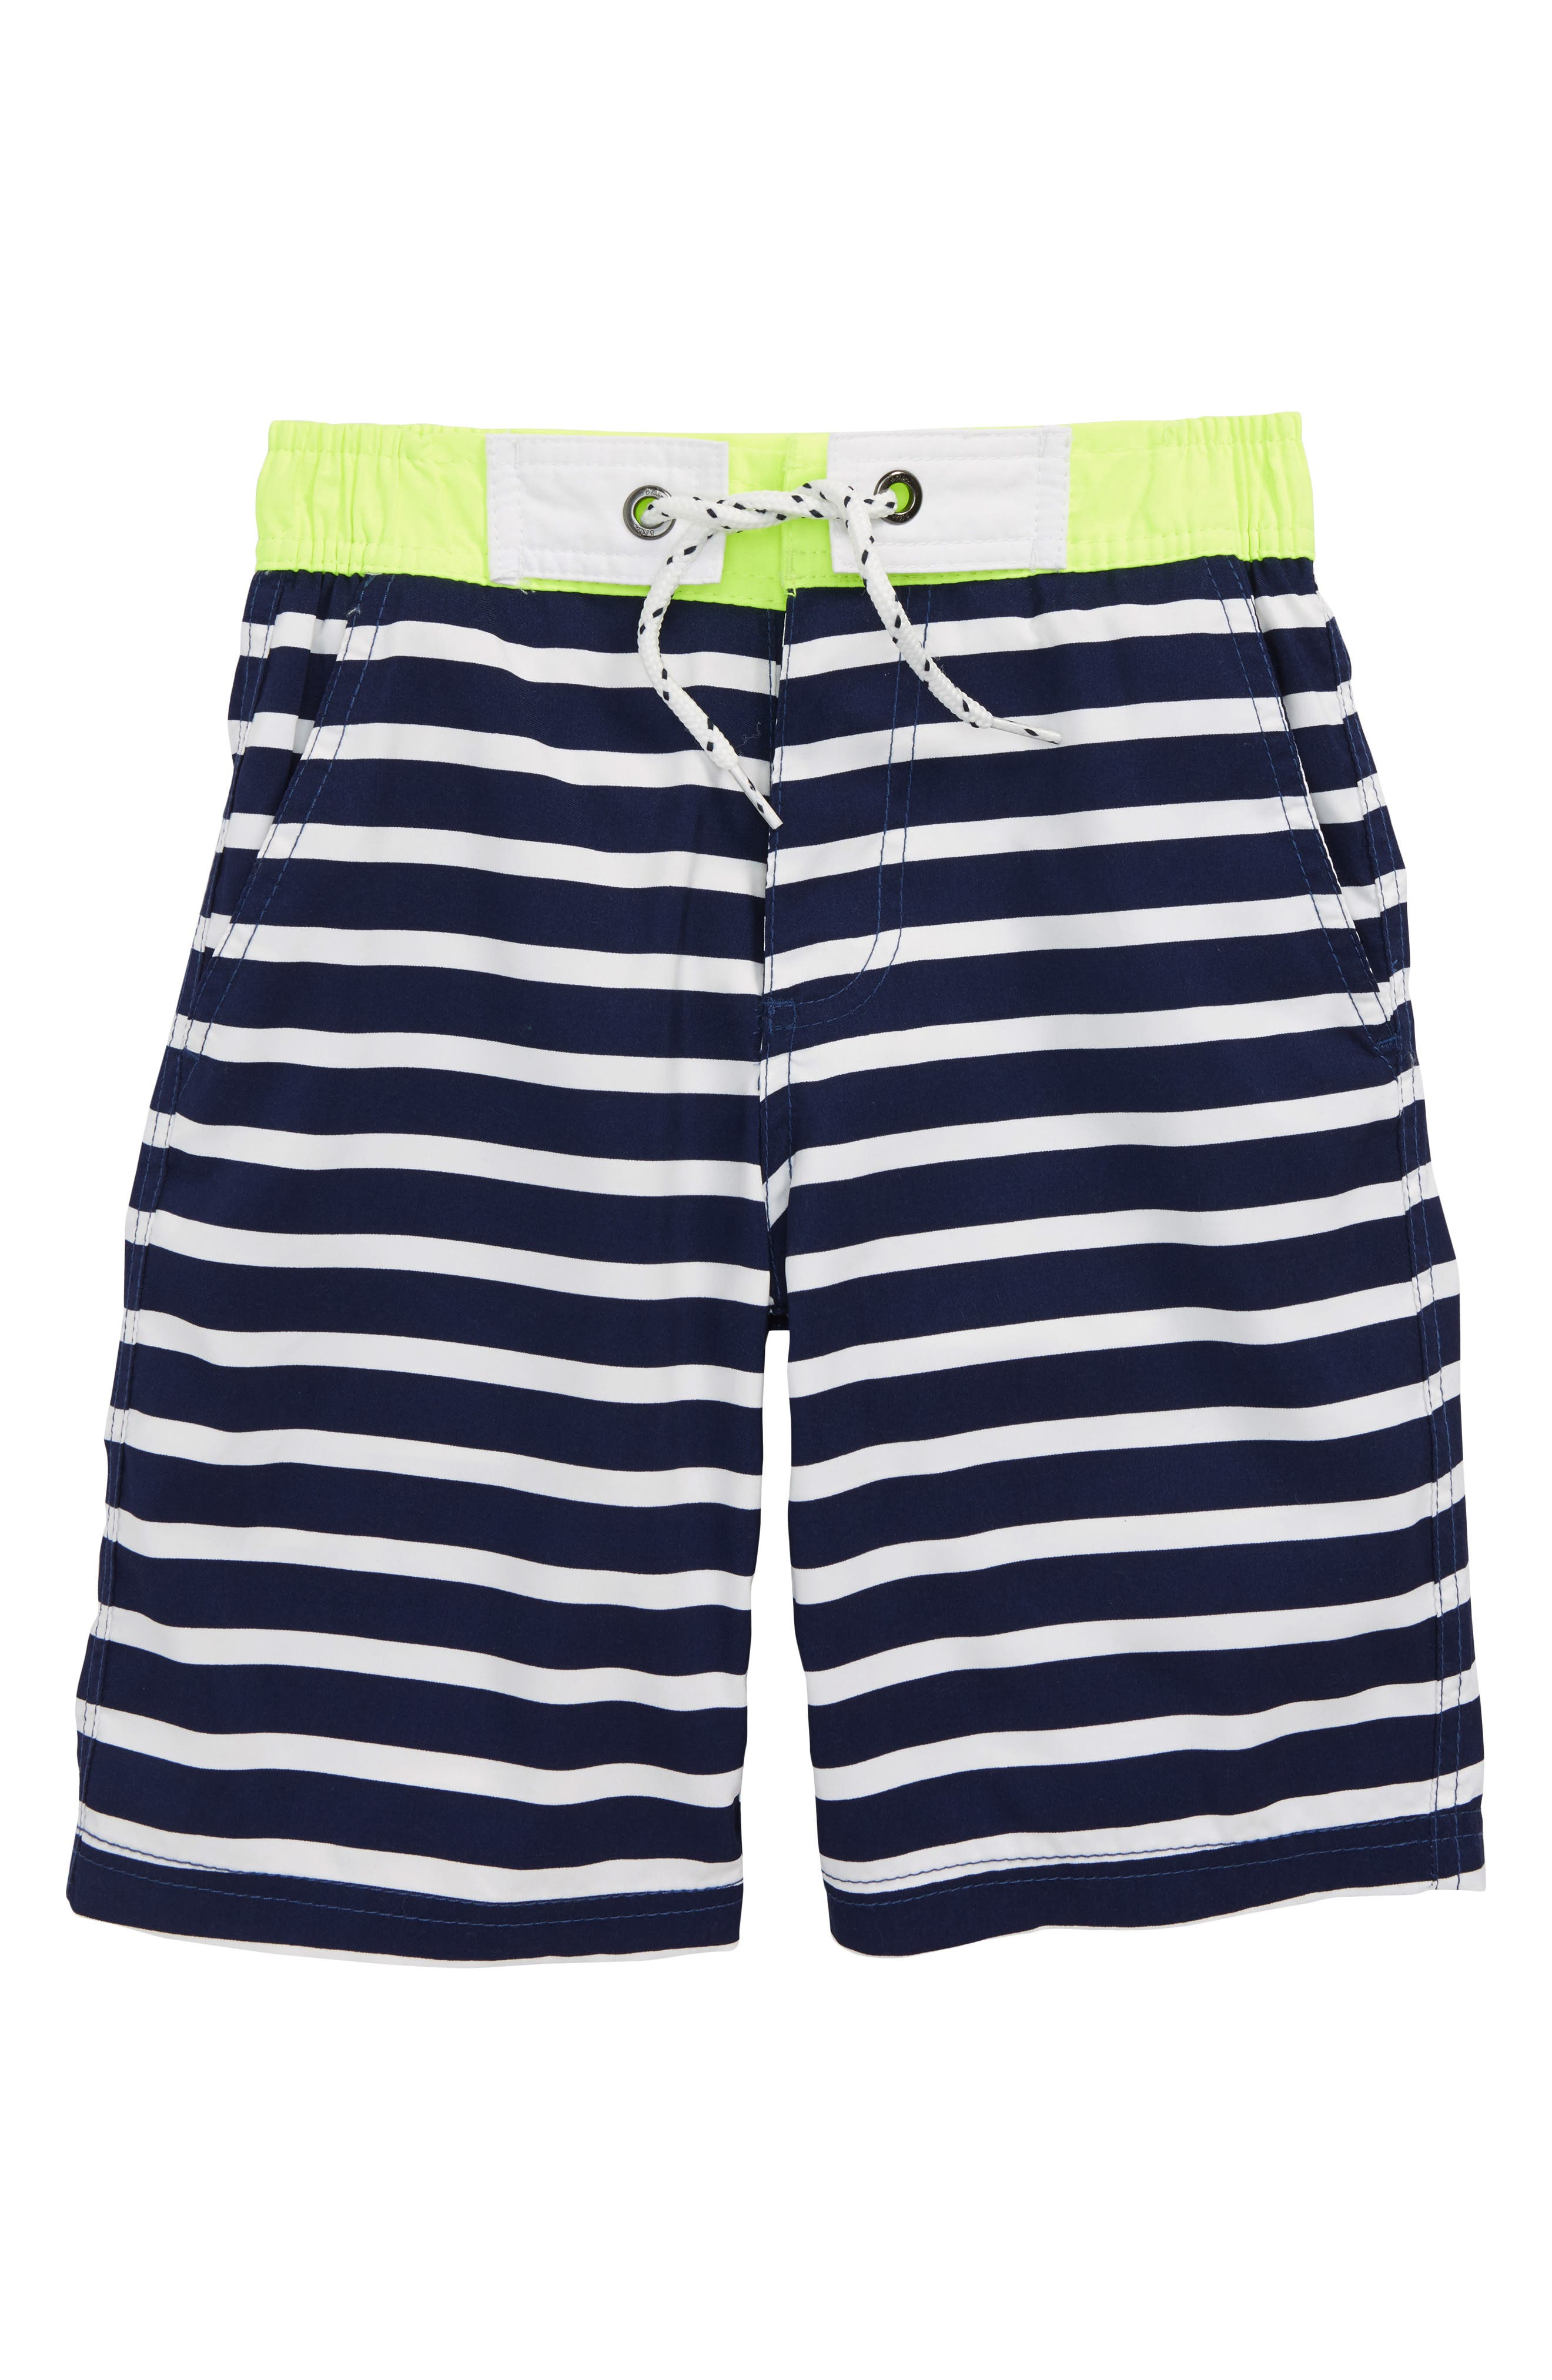 Stripe Board Shorts,                         Main,                         color, Beacon Blue/ Ecru